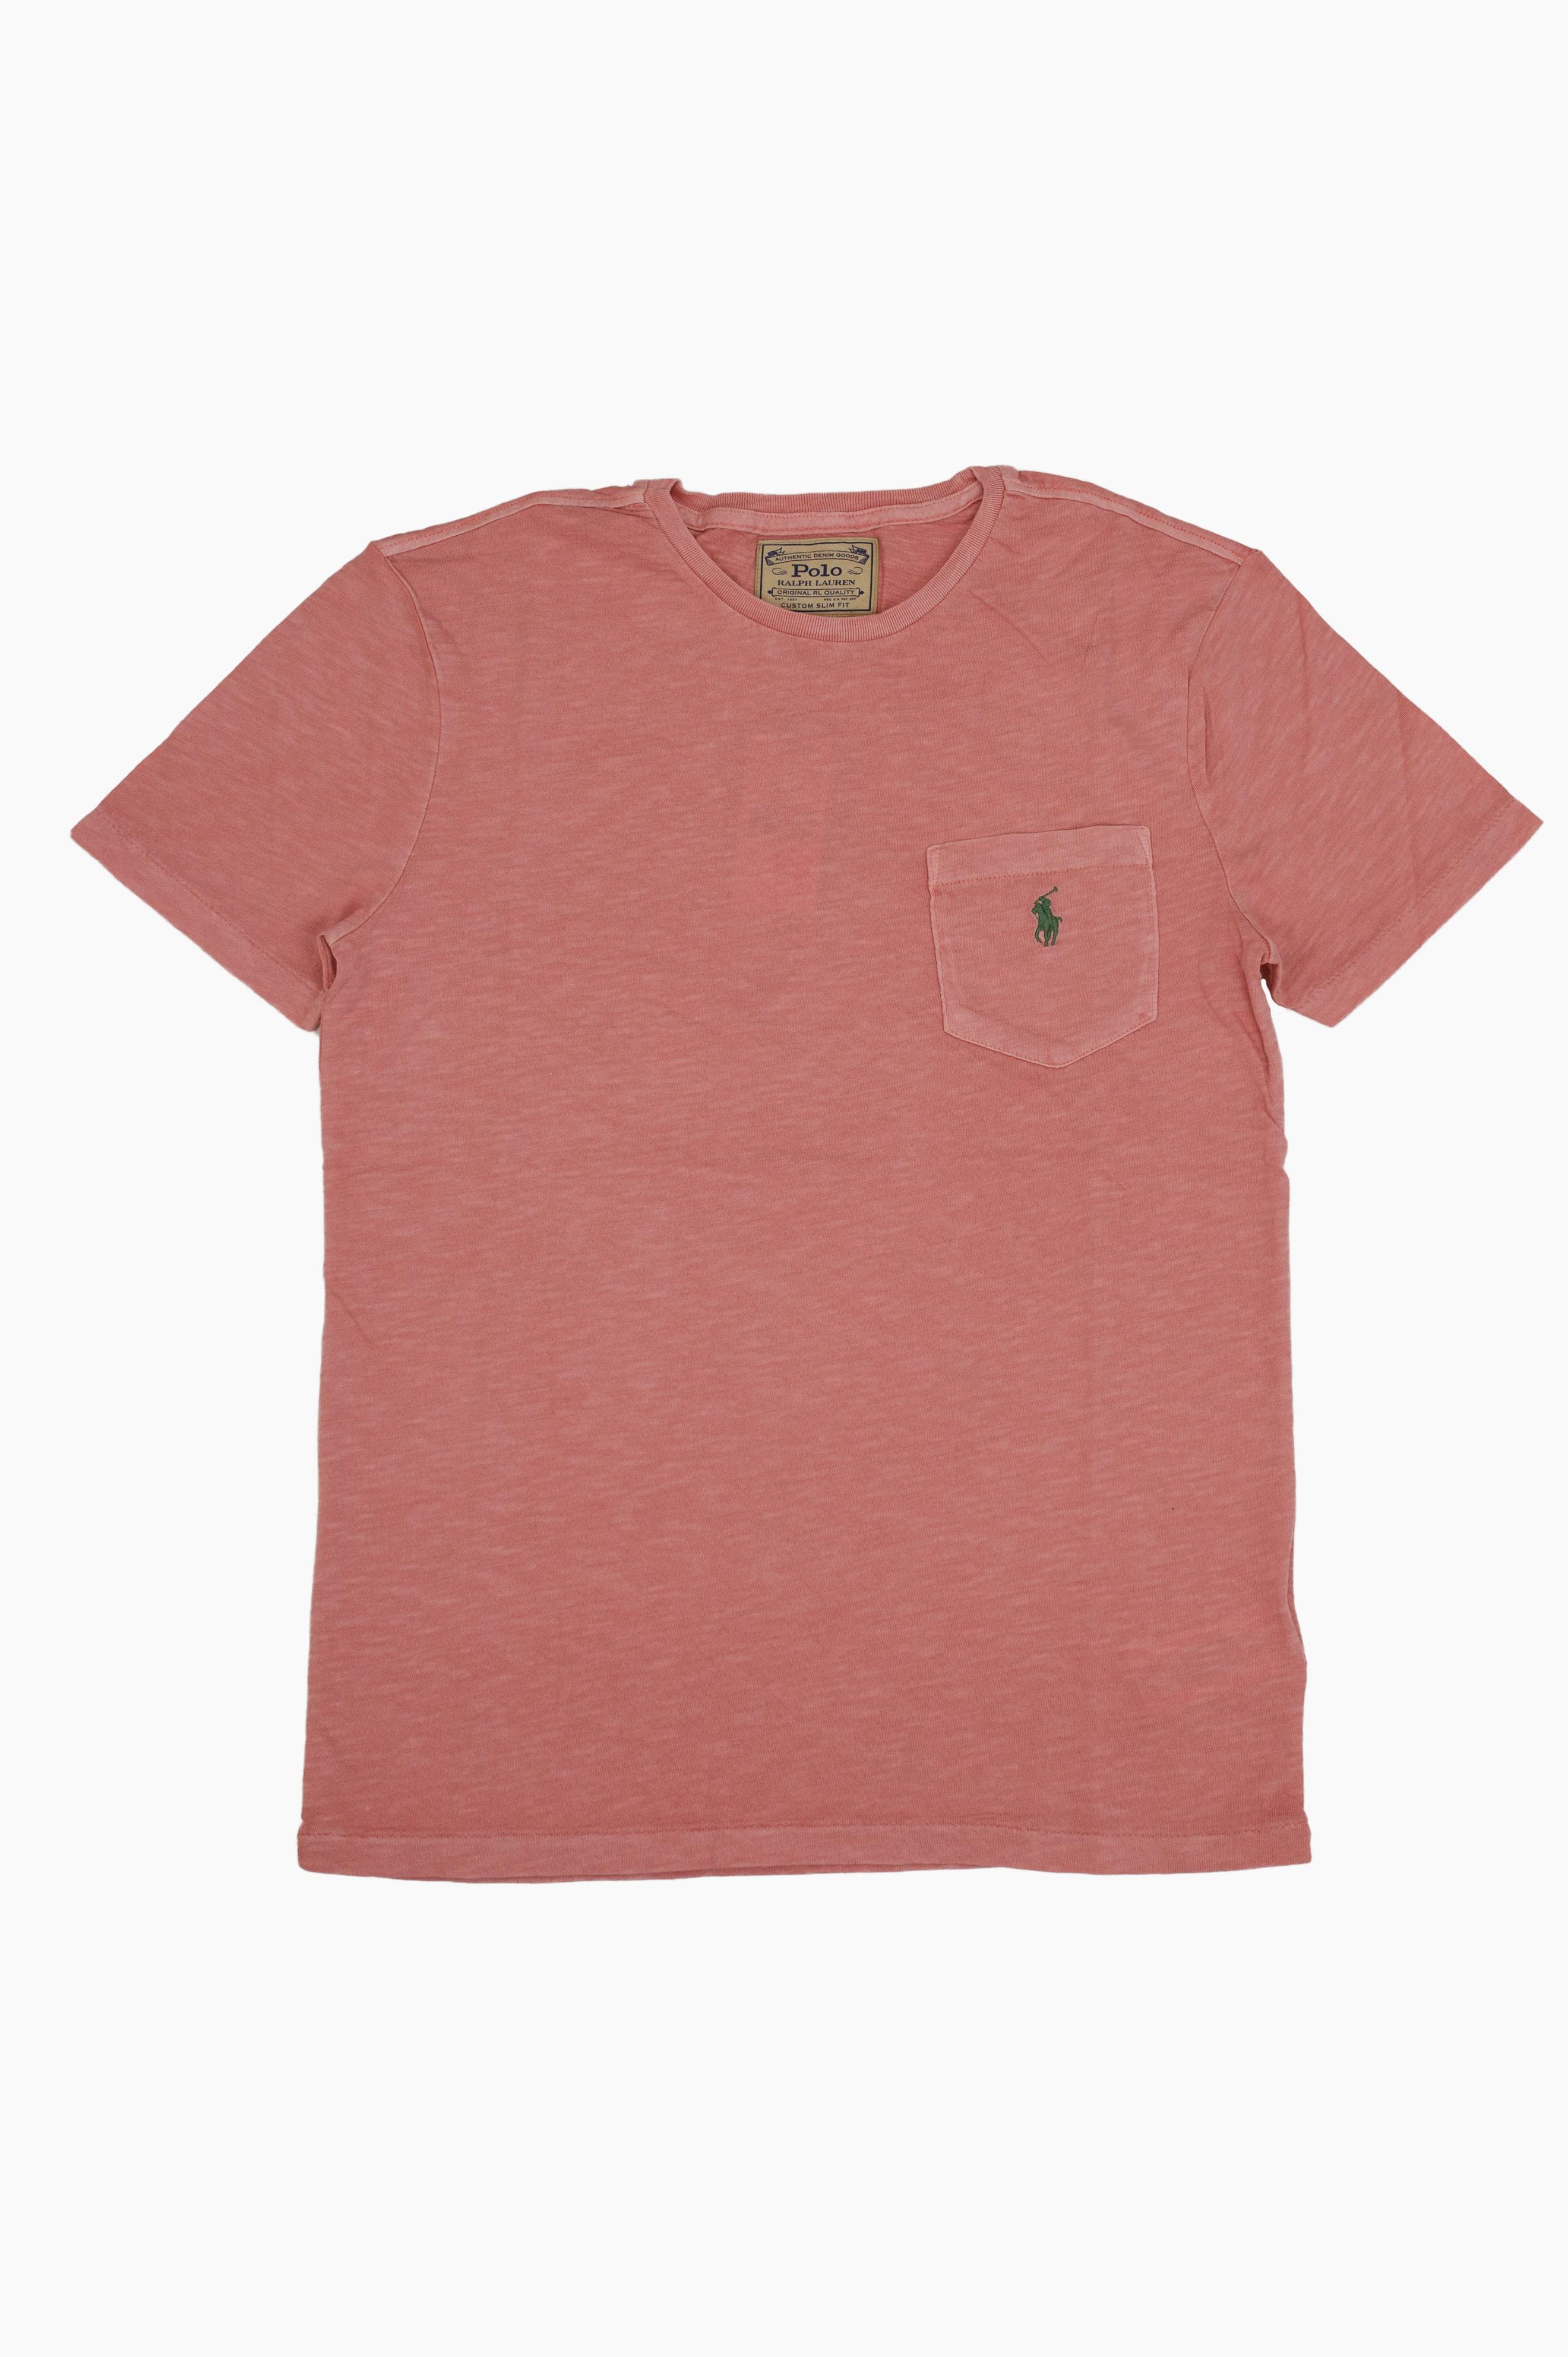 Washed Pocket T-Shirt Pink